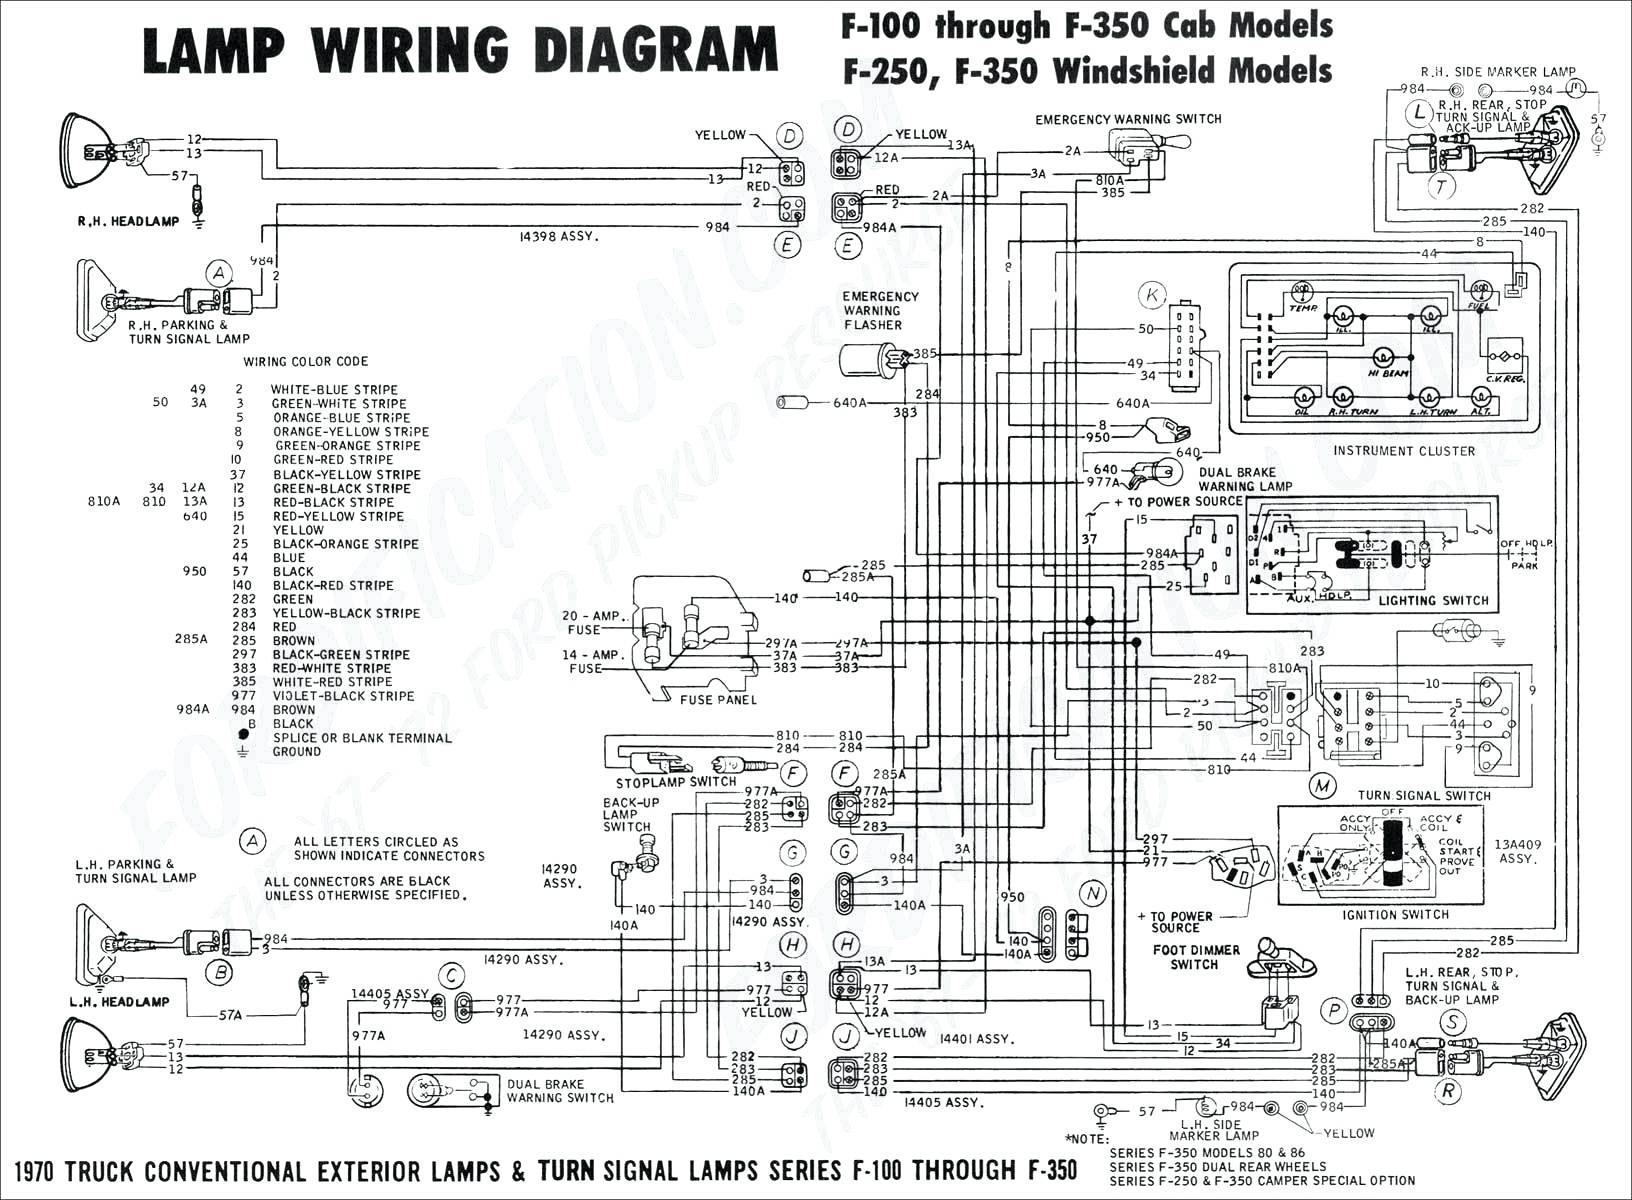 1967 ford f100 wiring diagram wiring diagram image rh mainetreasurechest com 1967 ford f100 turn signal wiring diagram 1967 ford f100 alternator wiring diagram